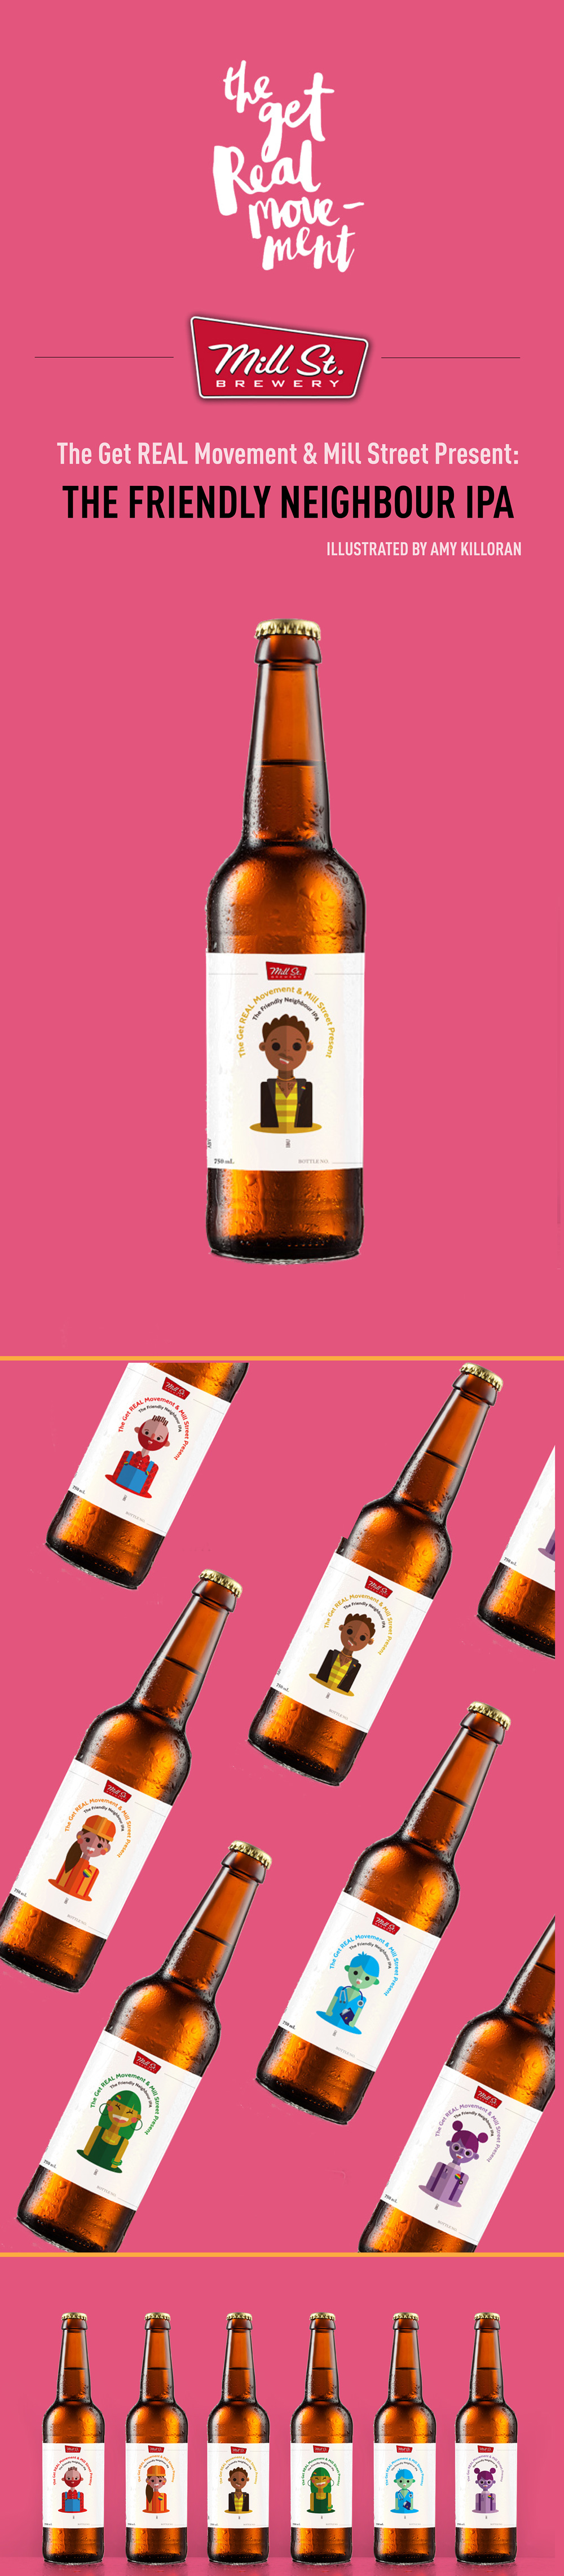 amy-killoran-get-real-movement-friendly-neighbour-beer-packaging.jpg